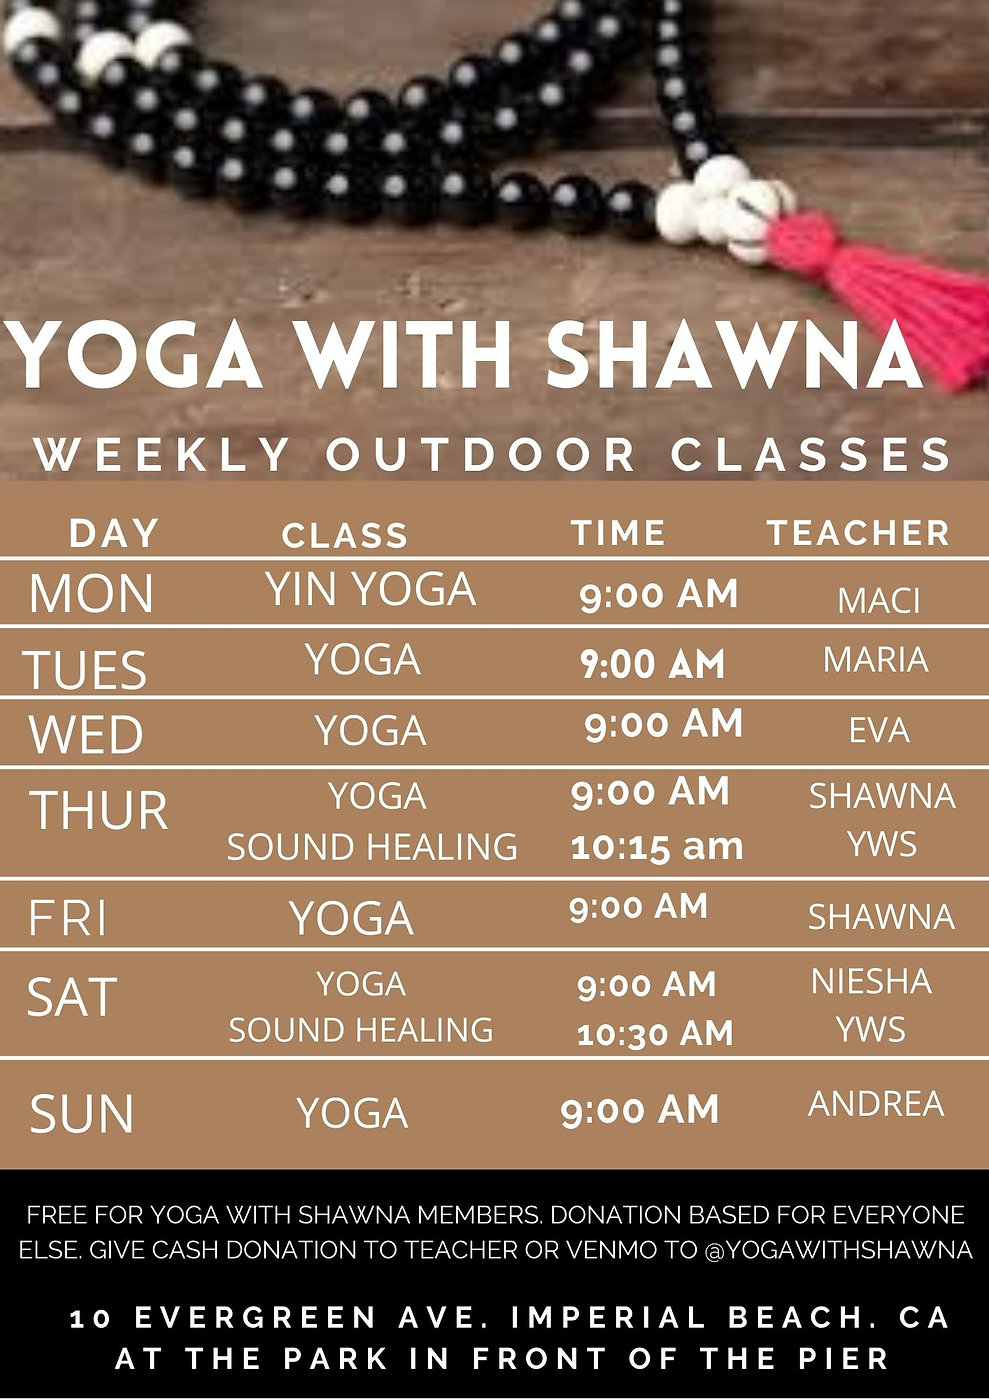 outdoor yoga yws-6.jpg